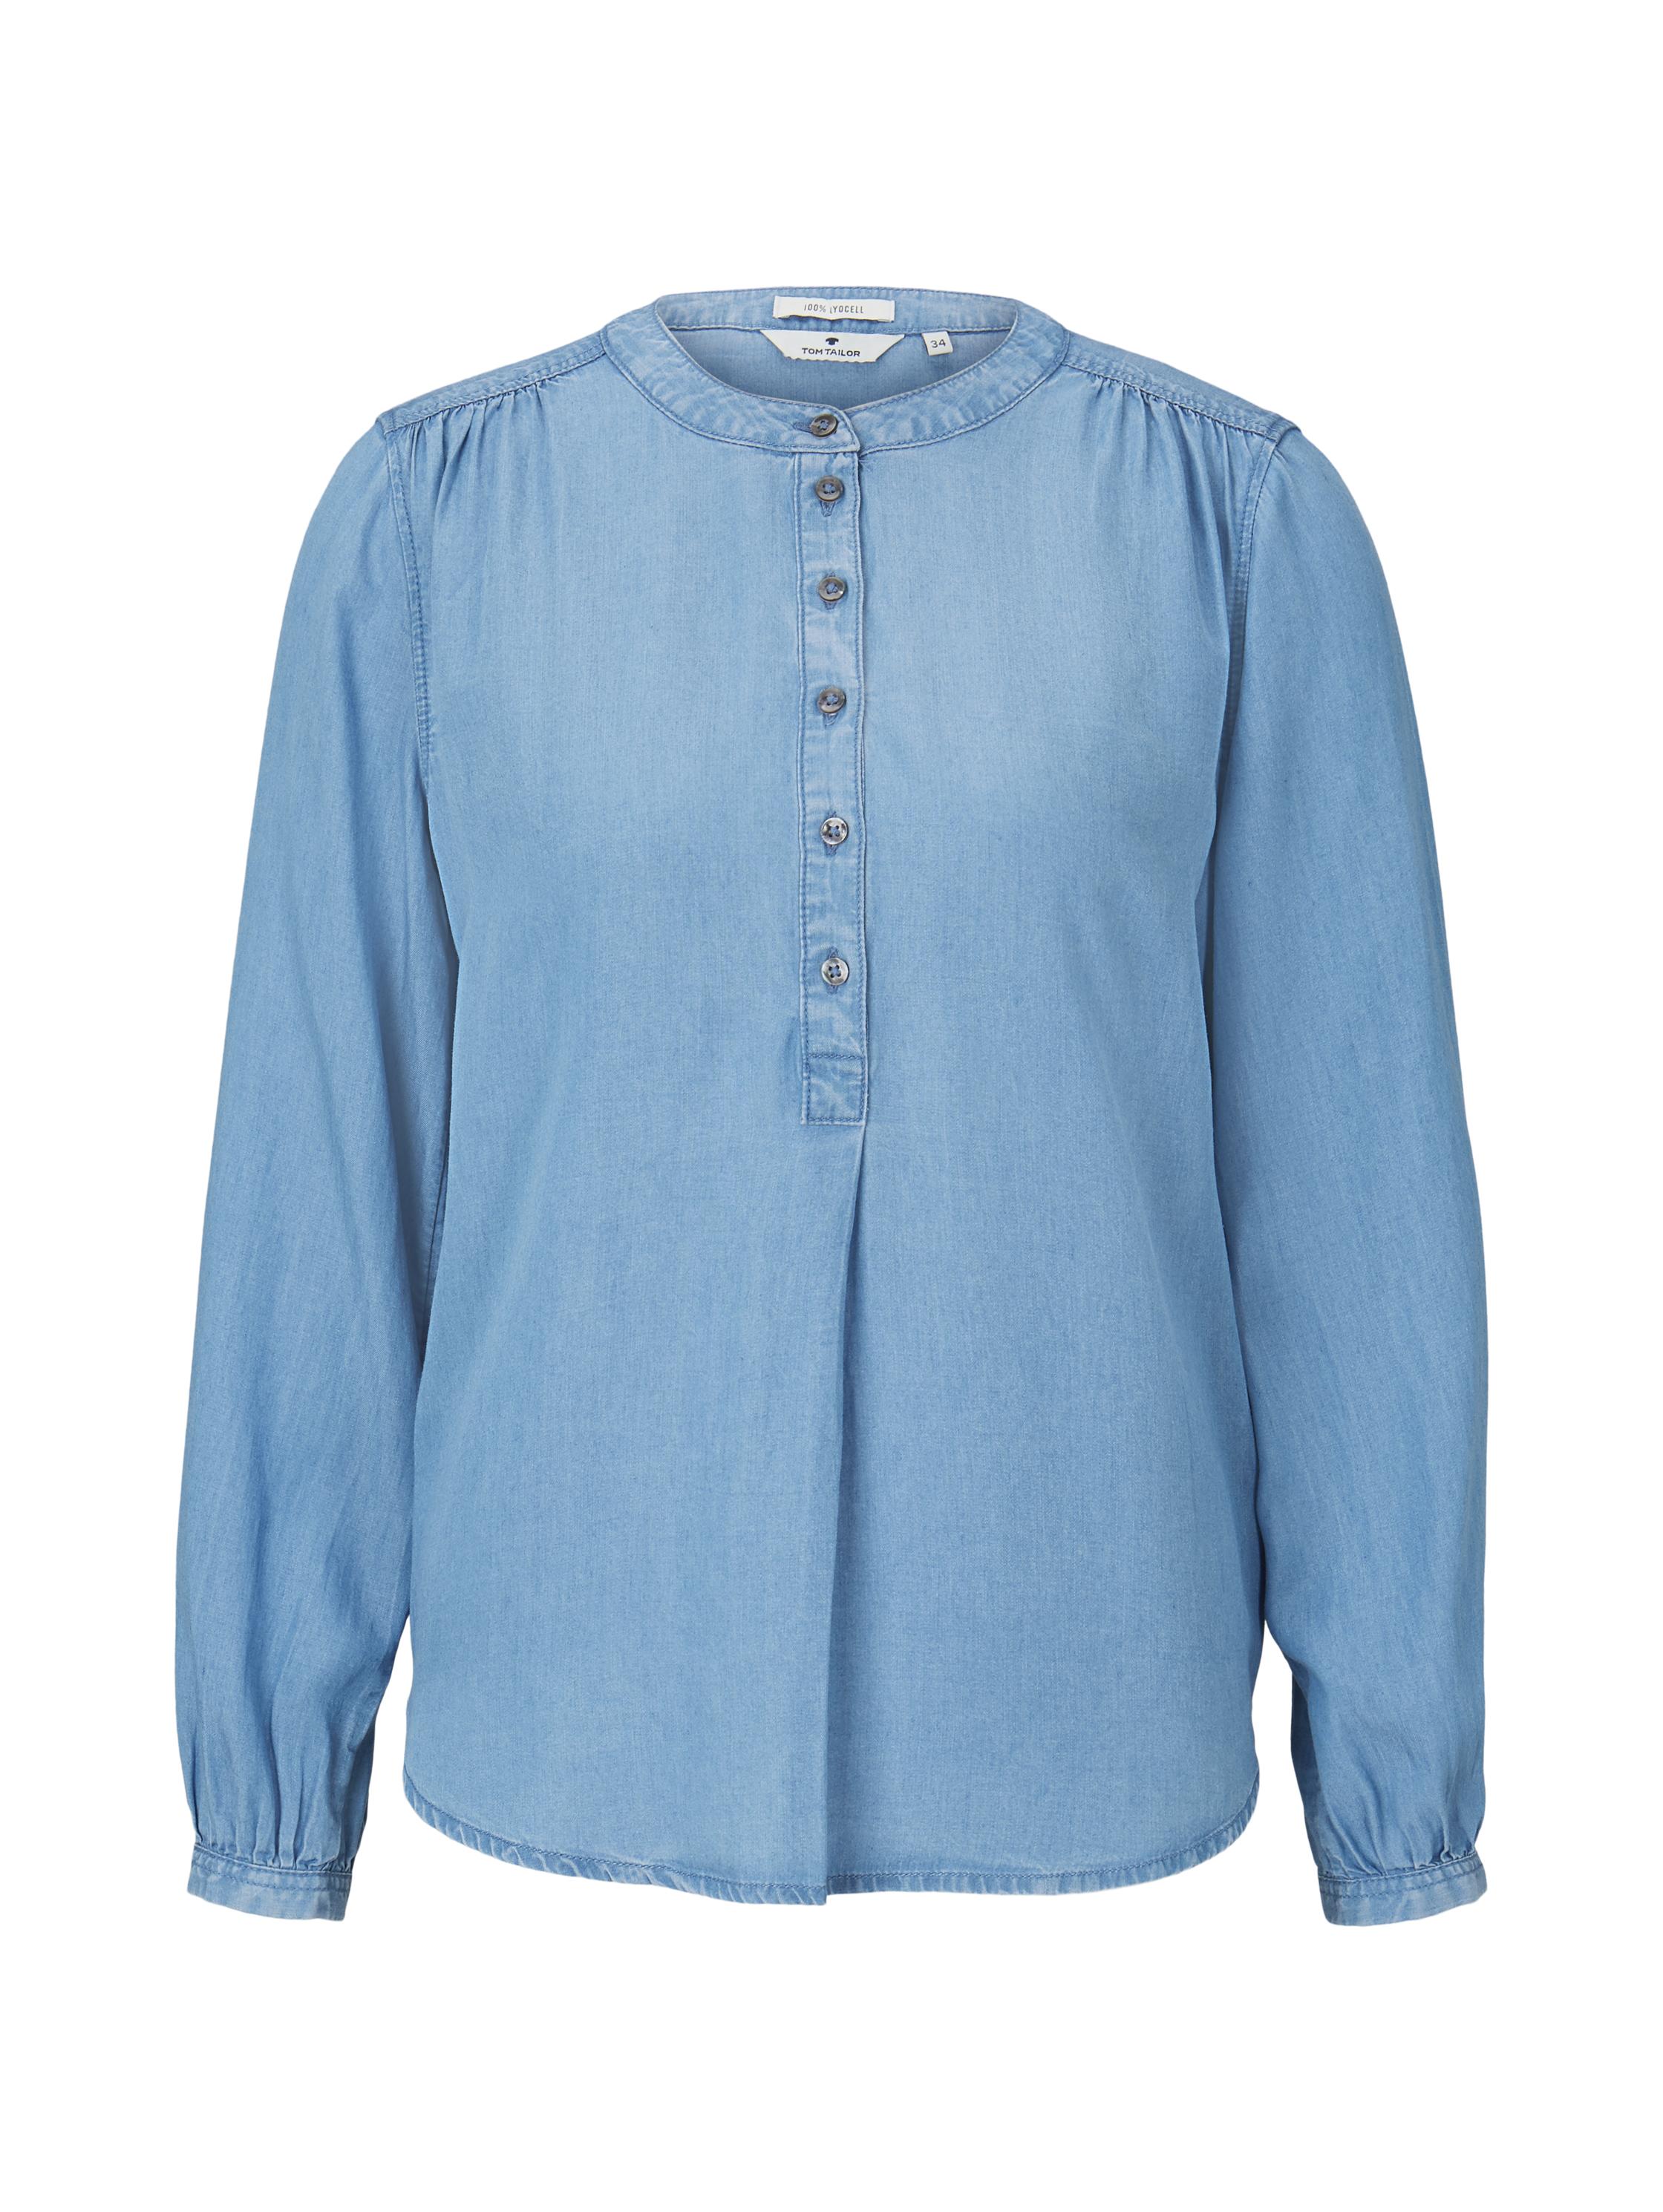 blouse denim look, Blue Denim